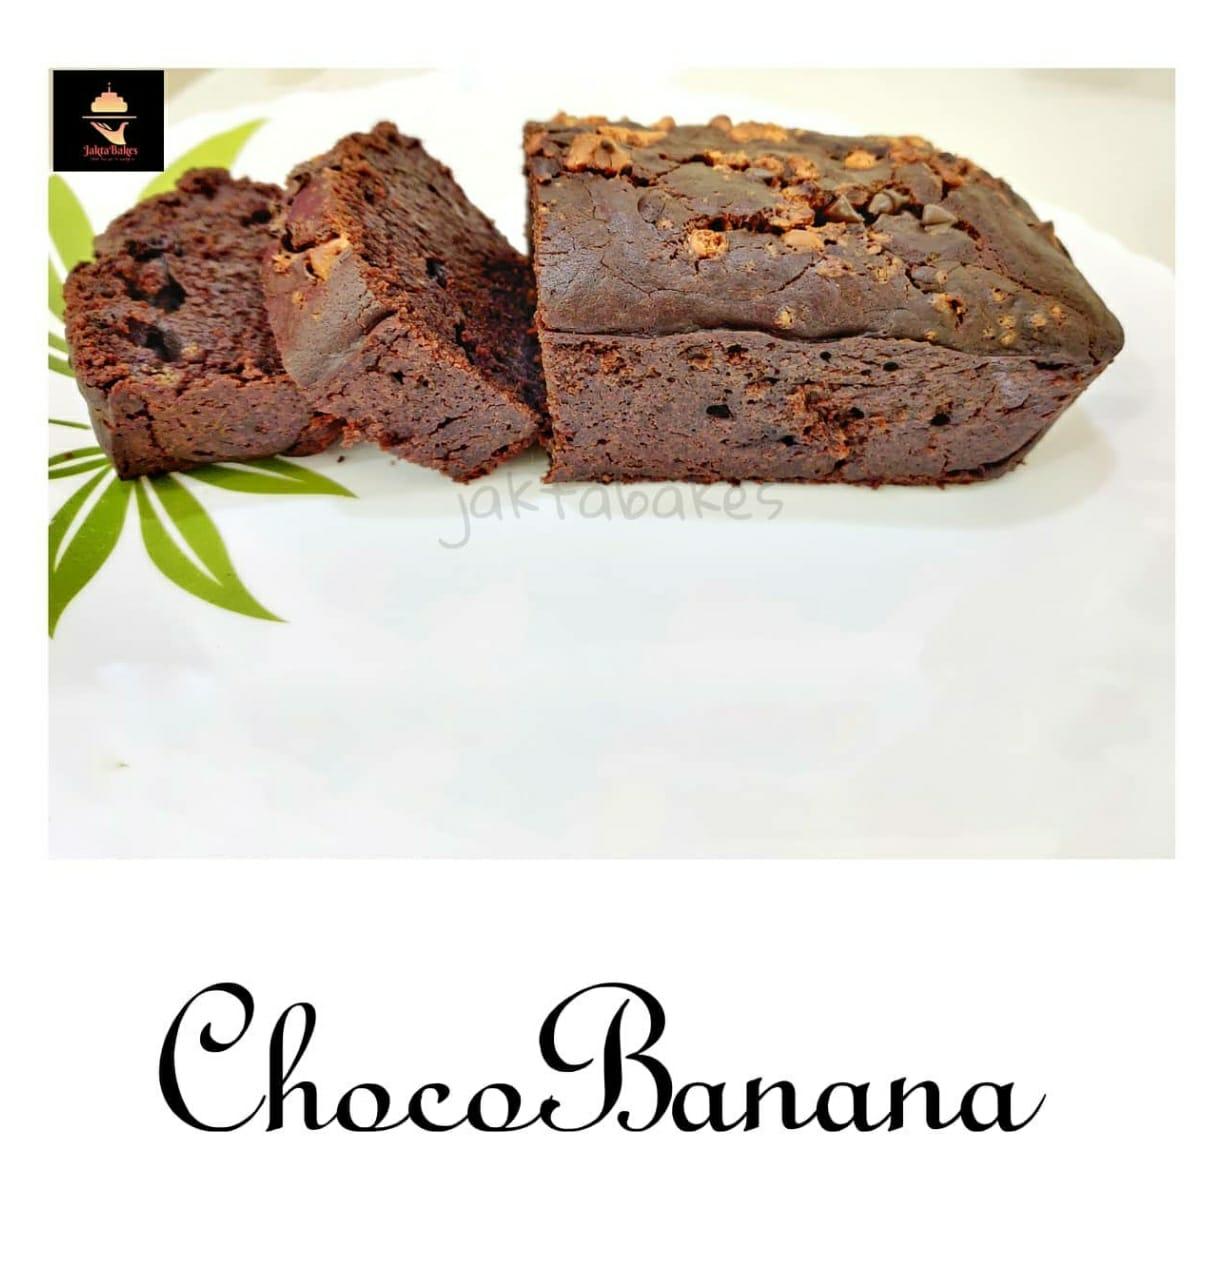 Choco Banana Cake Designs, Images, Price Near Me